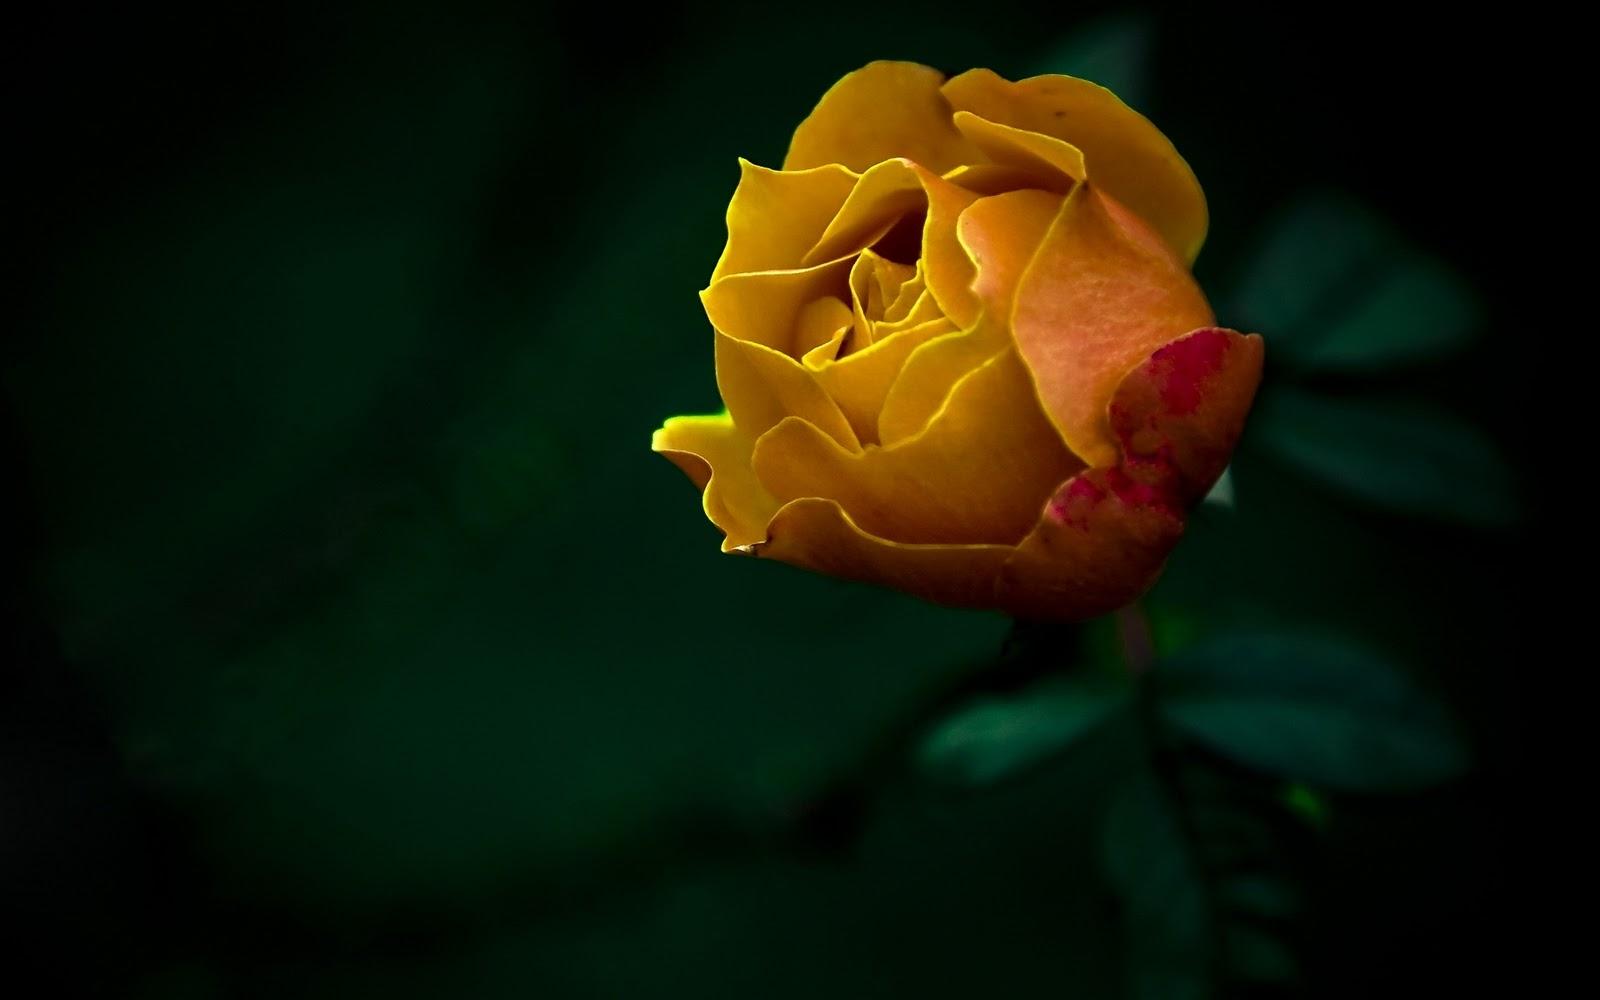 http://4.bp.blogspot.com/-whh7cfA1n_4/TyQG7ACVT6I/AAAAAAAAAMY/_rBQt8xicm8/s1600/Yellow+Rose+HQ+Wallpaper.jpg